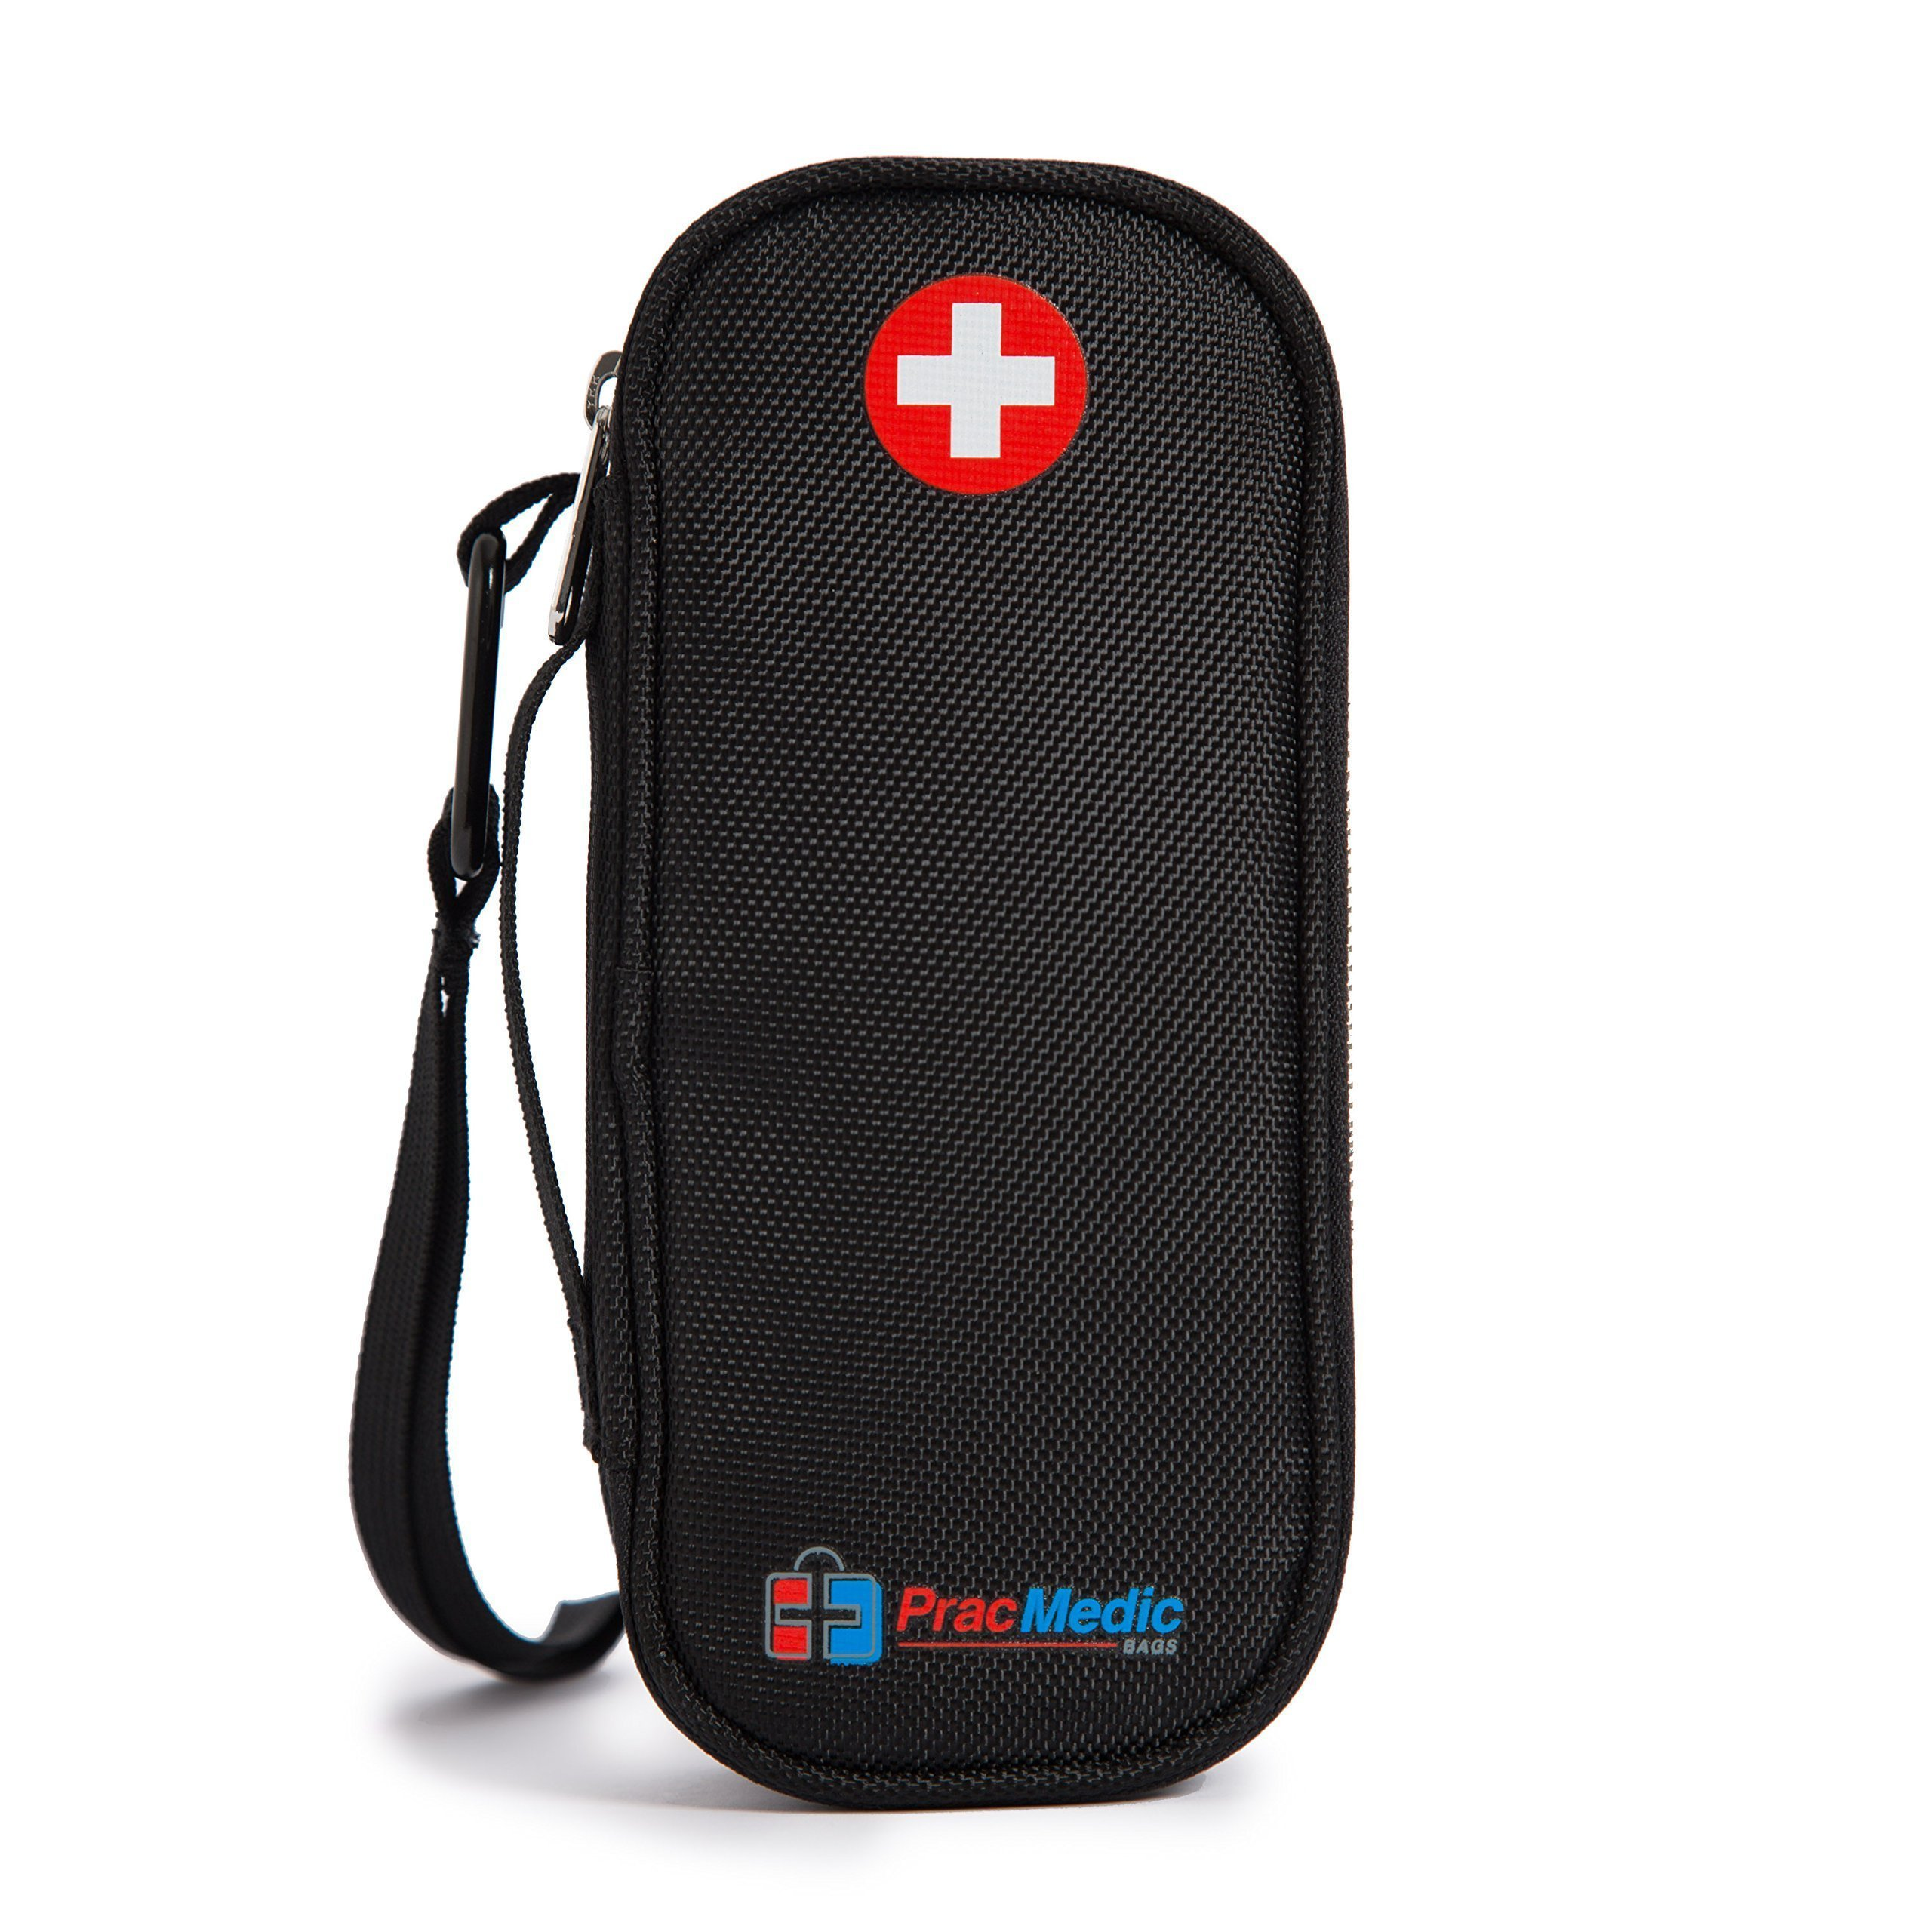 EPIPEN Case - fits 2 Epi Pens or Auvi-Q, Asthma Inhaler, generic Benadryl, Nasal Spray, Eye Drops, Medicine. INSULIN Case - fits 2 Insulin Pens, Vials, Syringes, Ice Packs (Black)